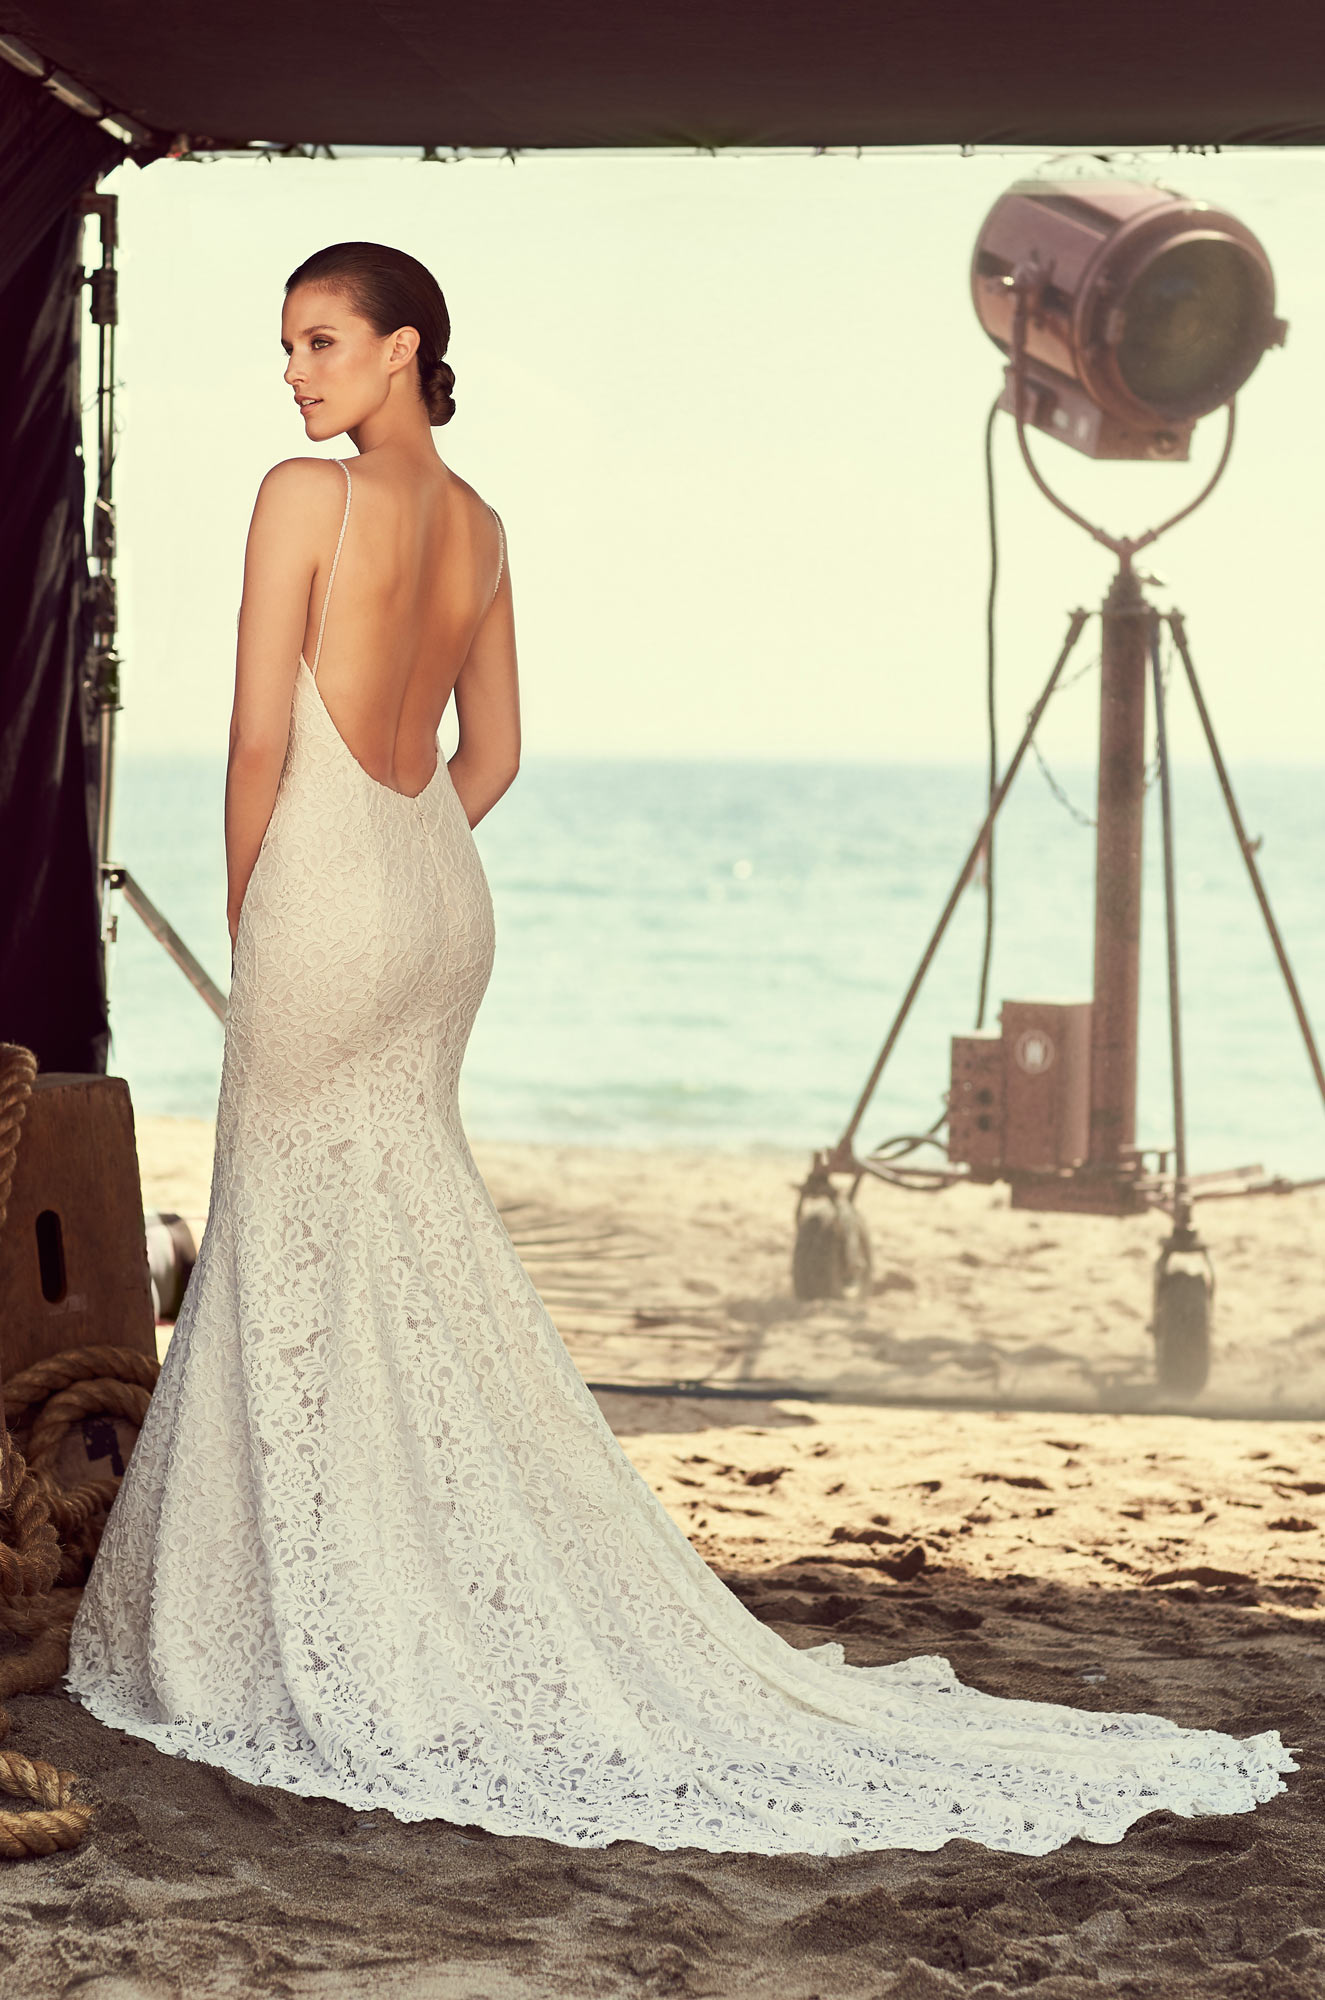 Lace Scoop Neck Wedding Dress – Style #2186 | Mikaella Bridal